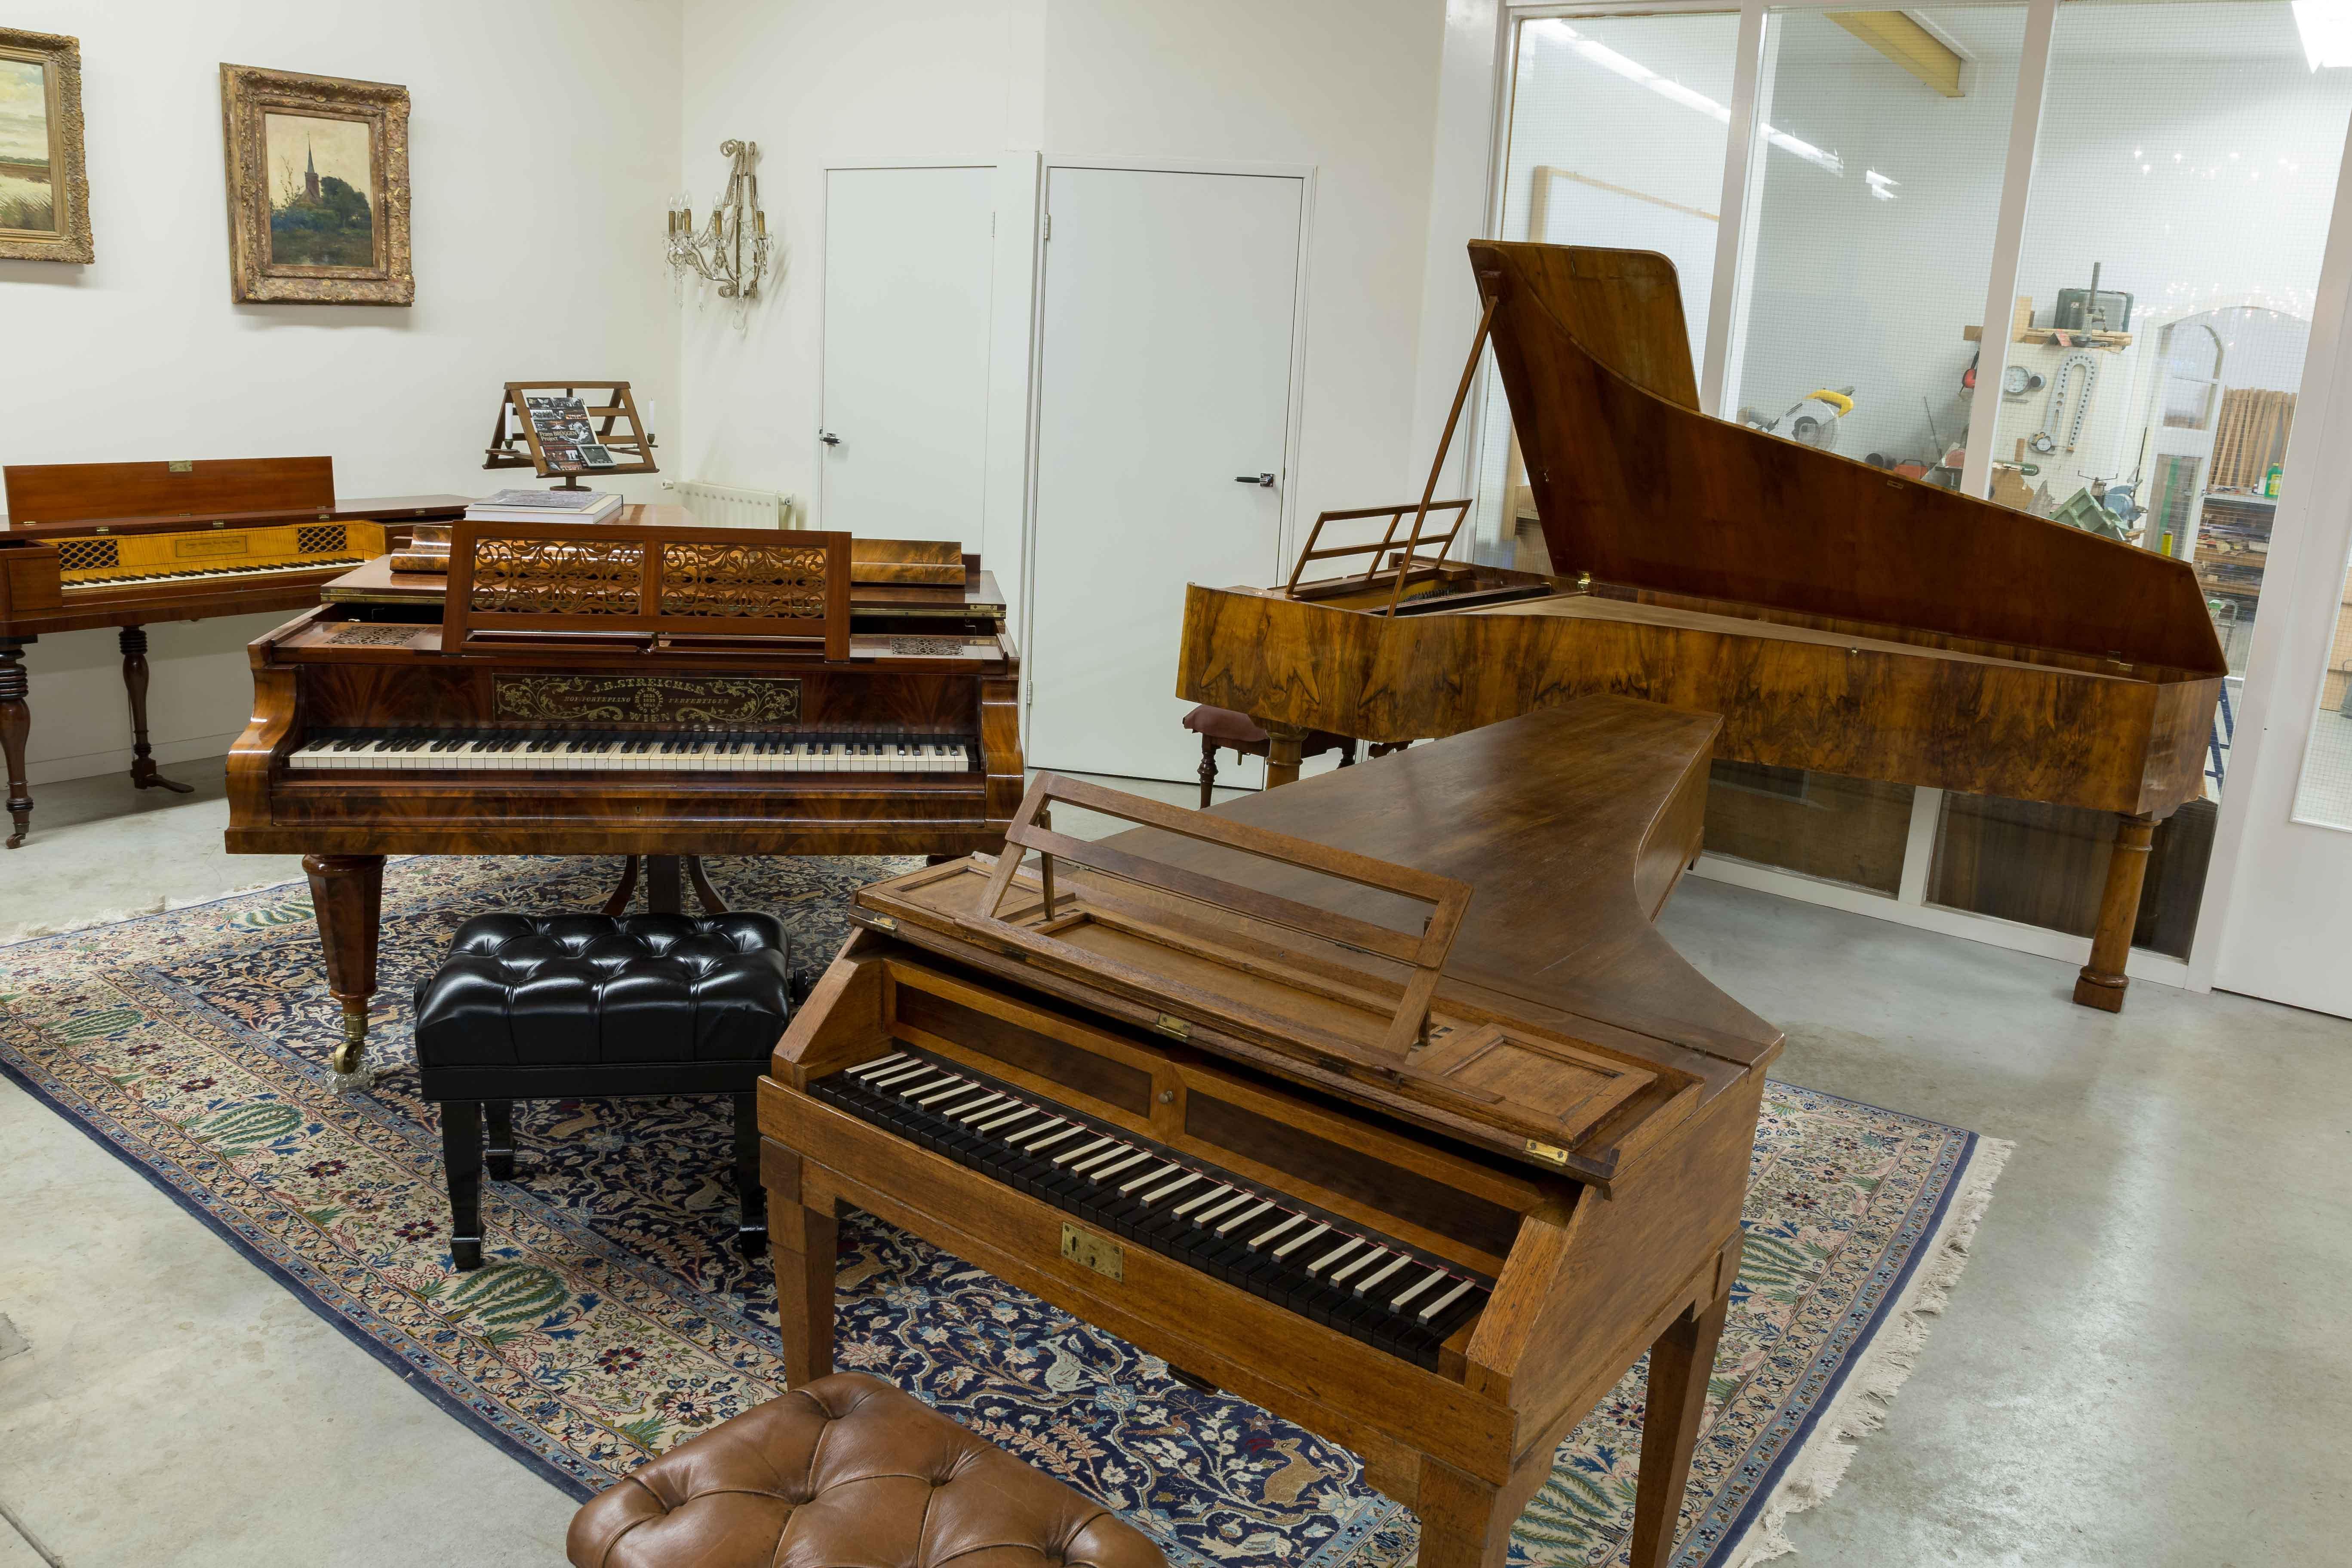 Studio facilities